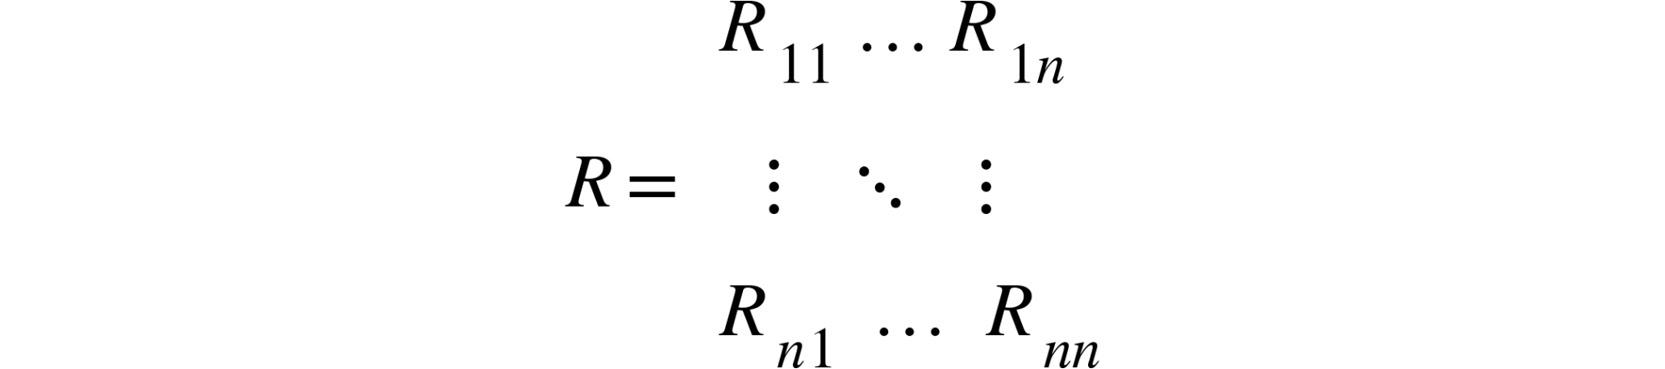 Figure 2.11: Reward matrix